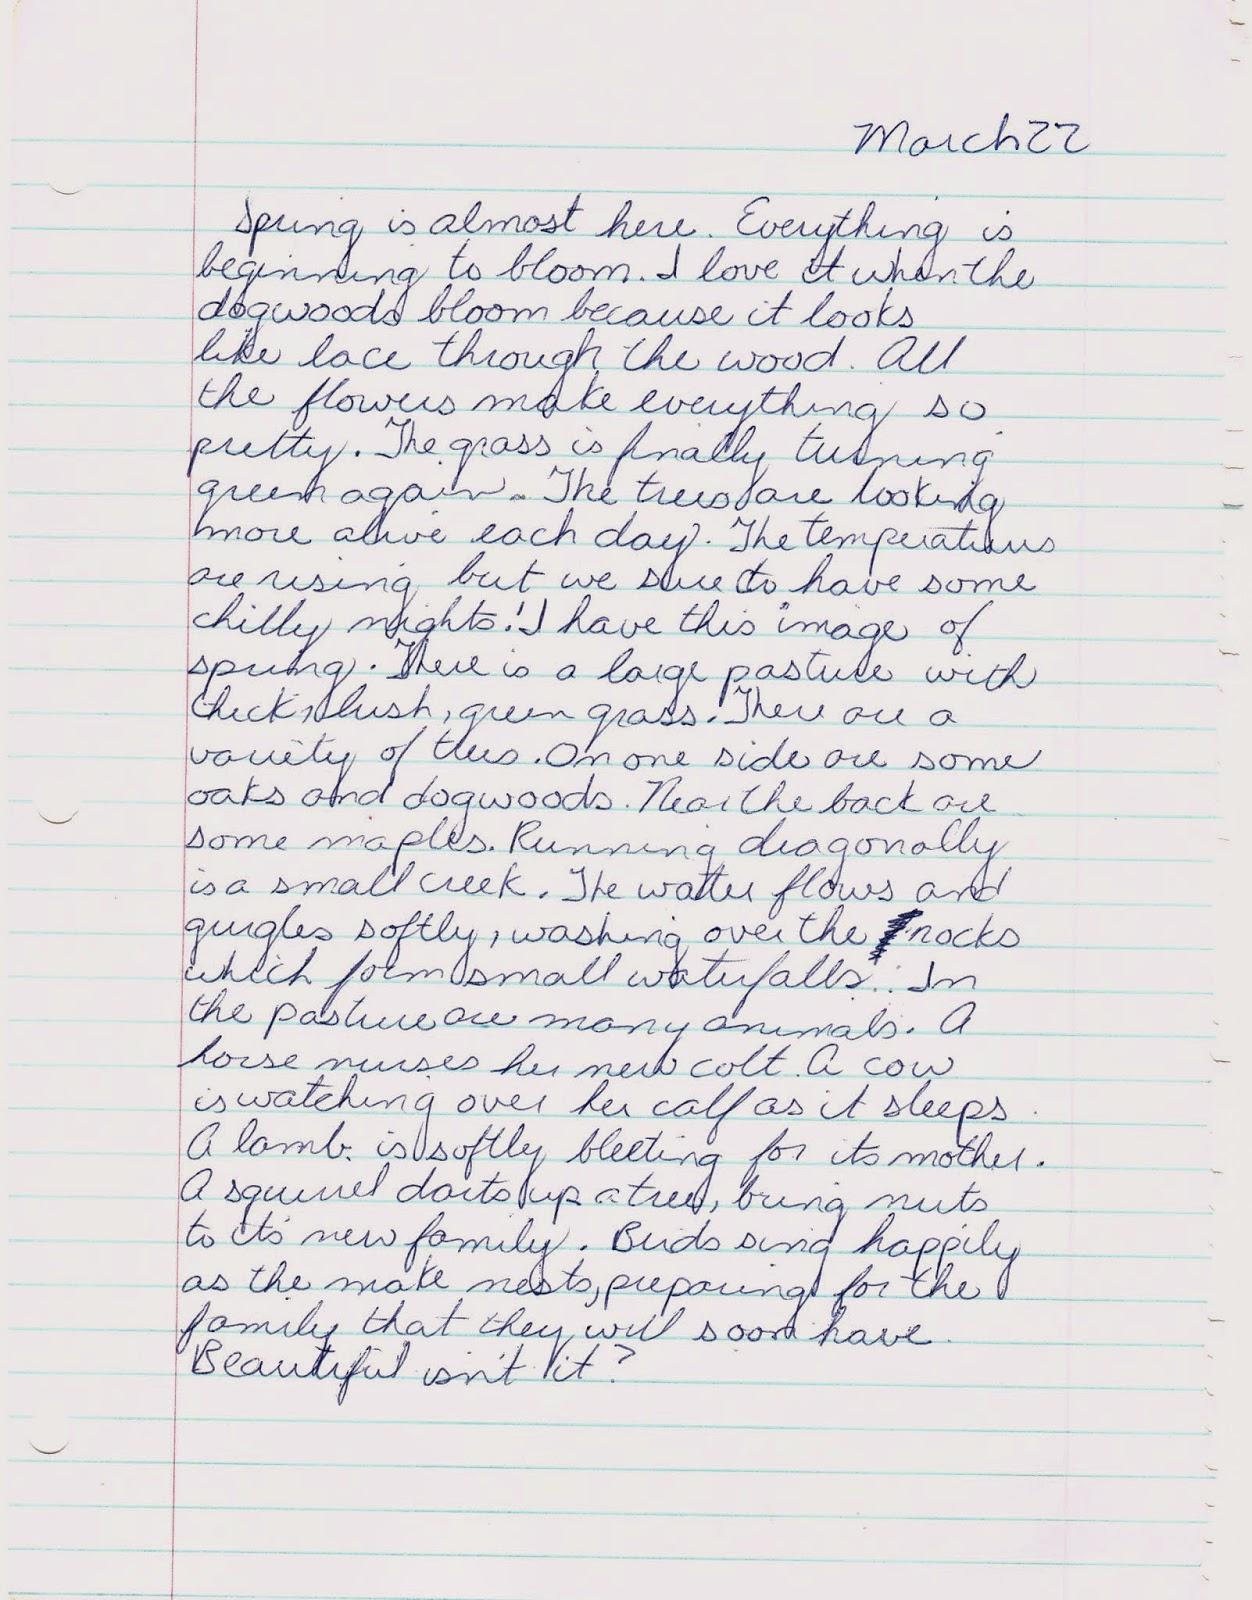 003 Essay Example My Father Hero Unusual Parents Superhero Full